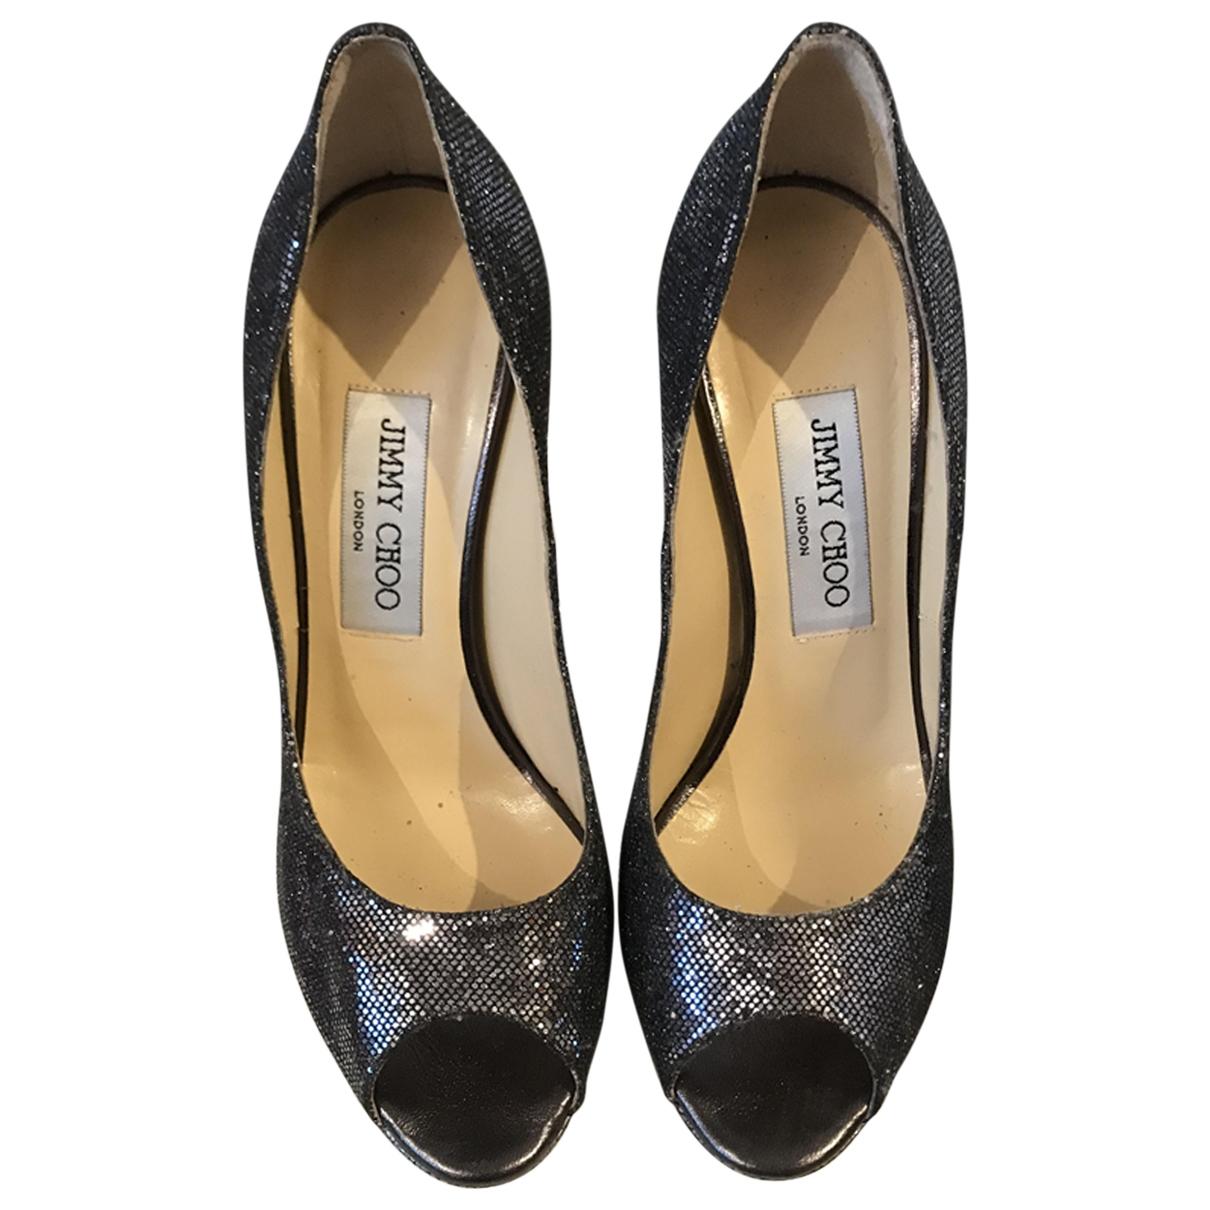 Jimmy Choo \N Blue Glitter Sandals for Women 36.5 EU